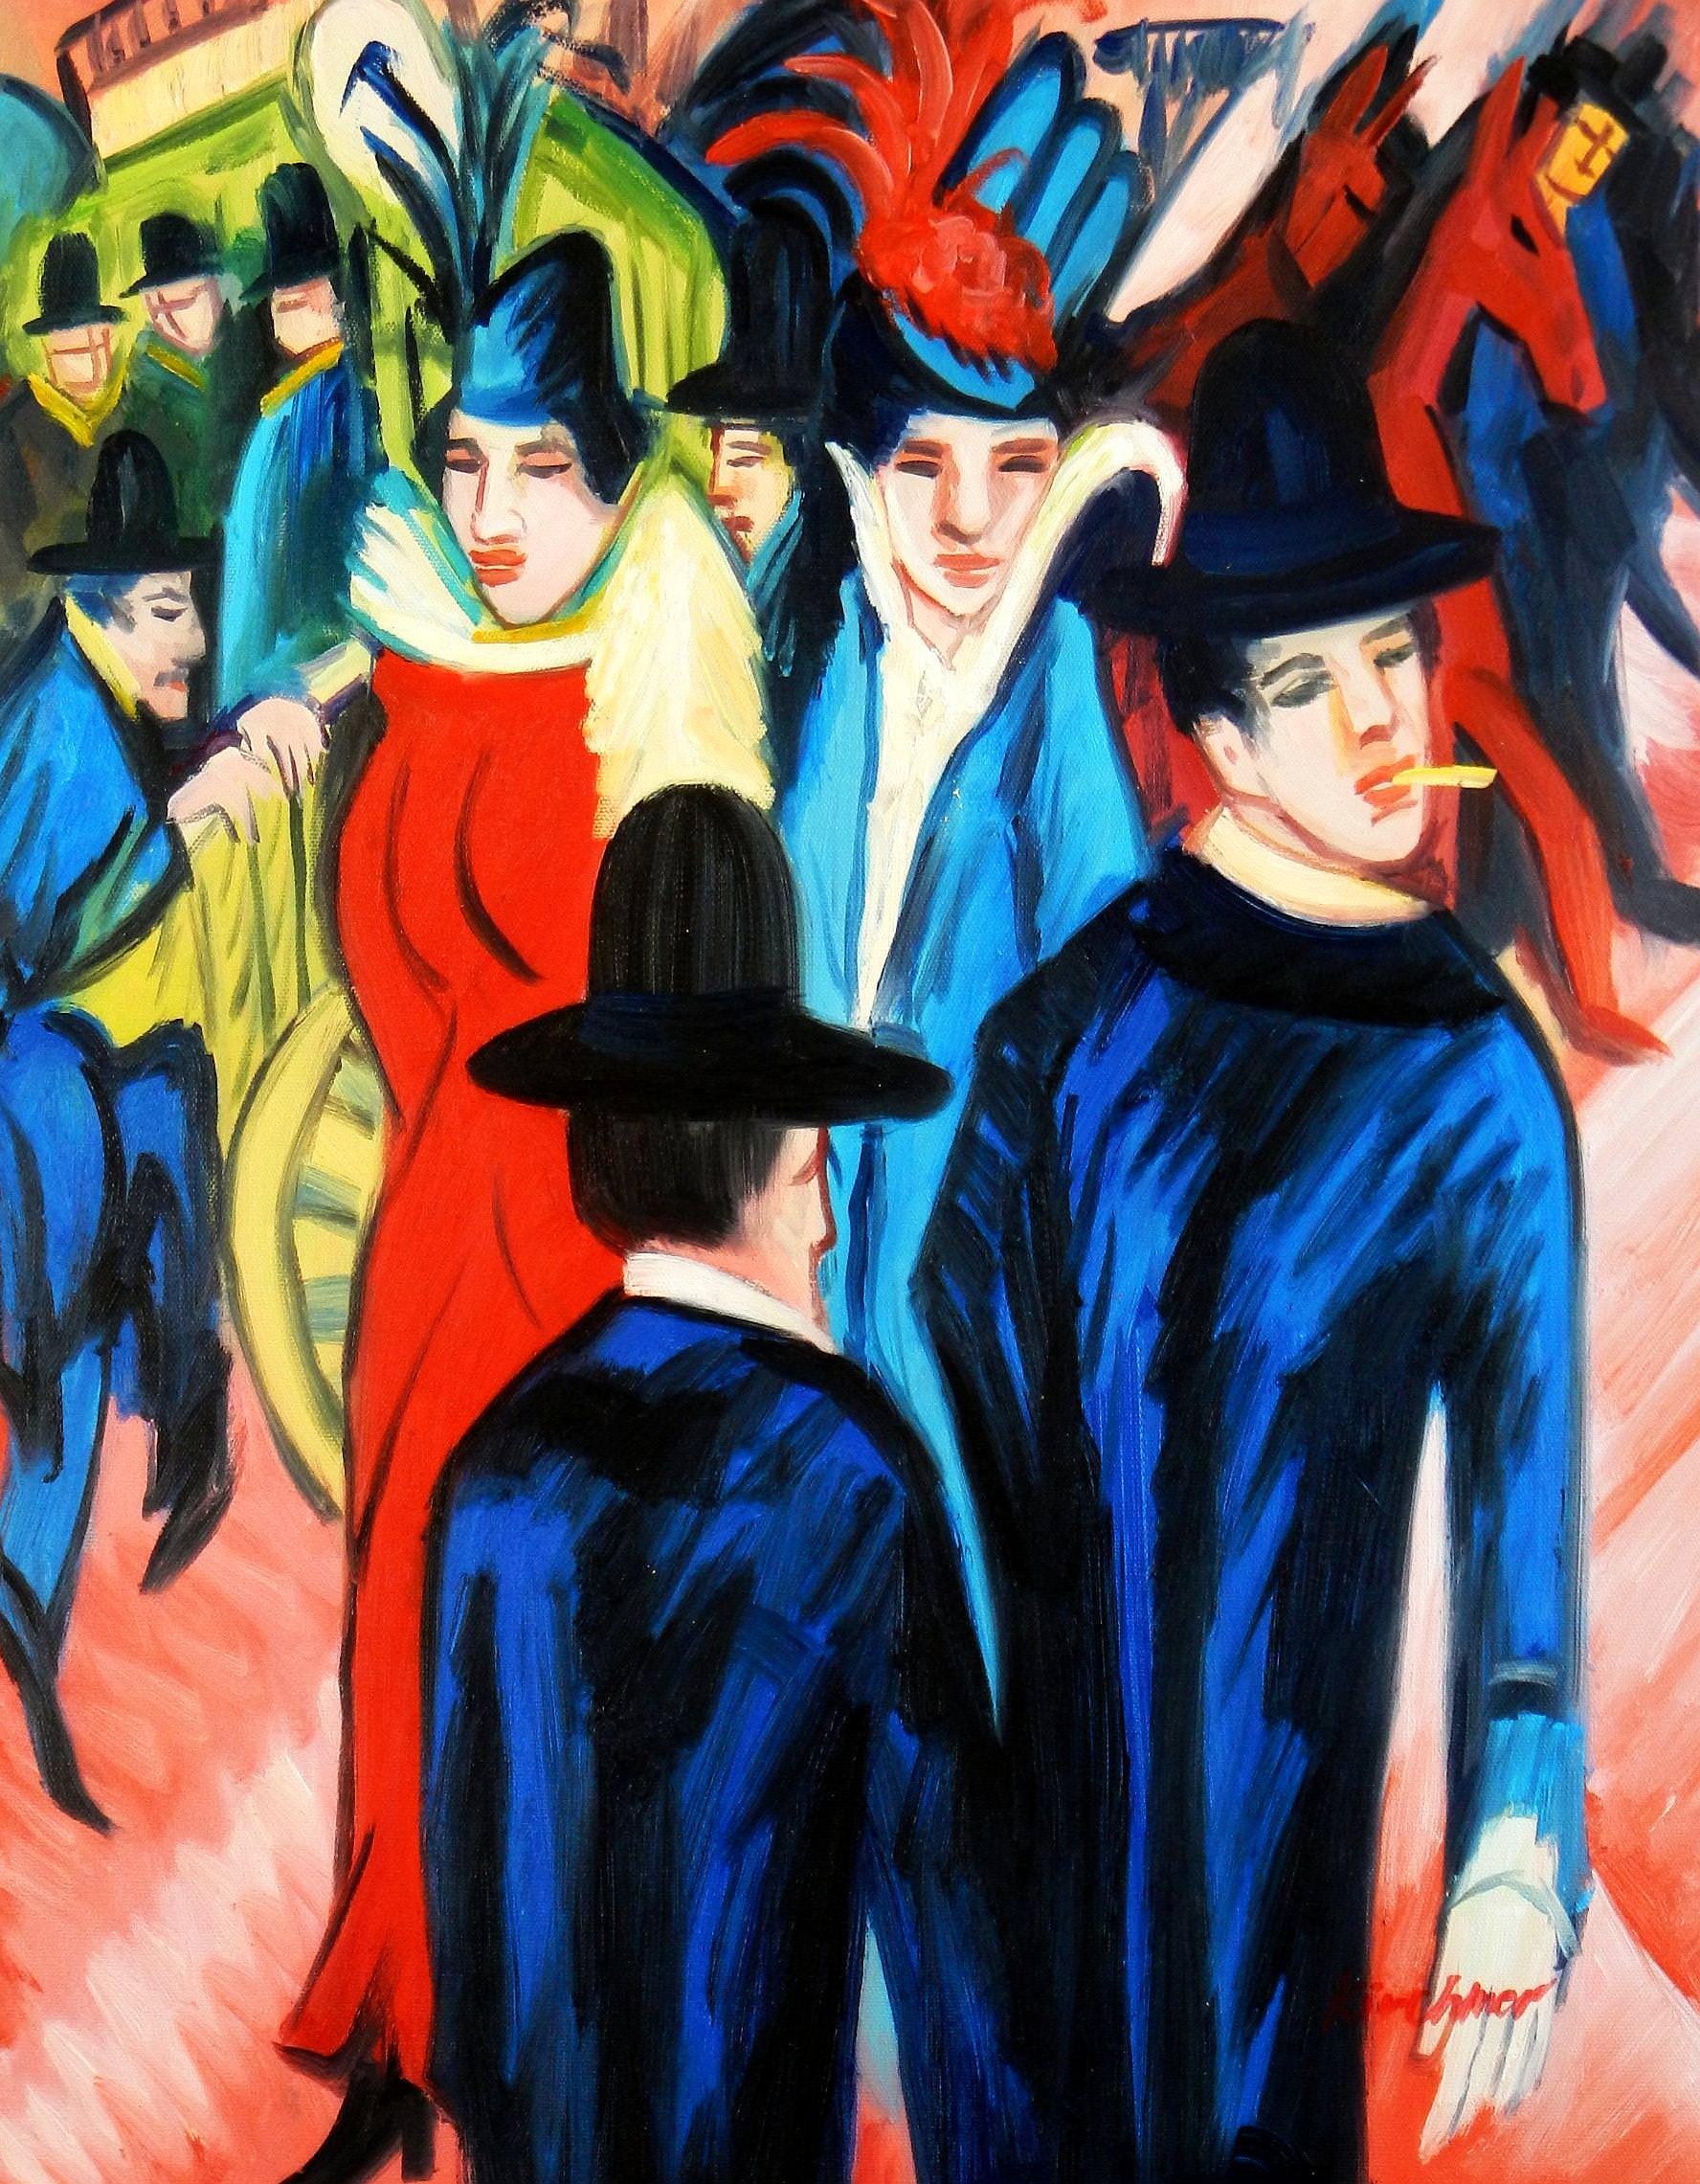 Ernst Ludwig Kirchner - Berliner Straßenszene b93620 40x50cm exquisites Ölbild